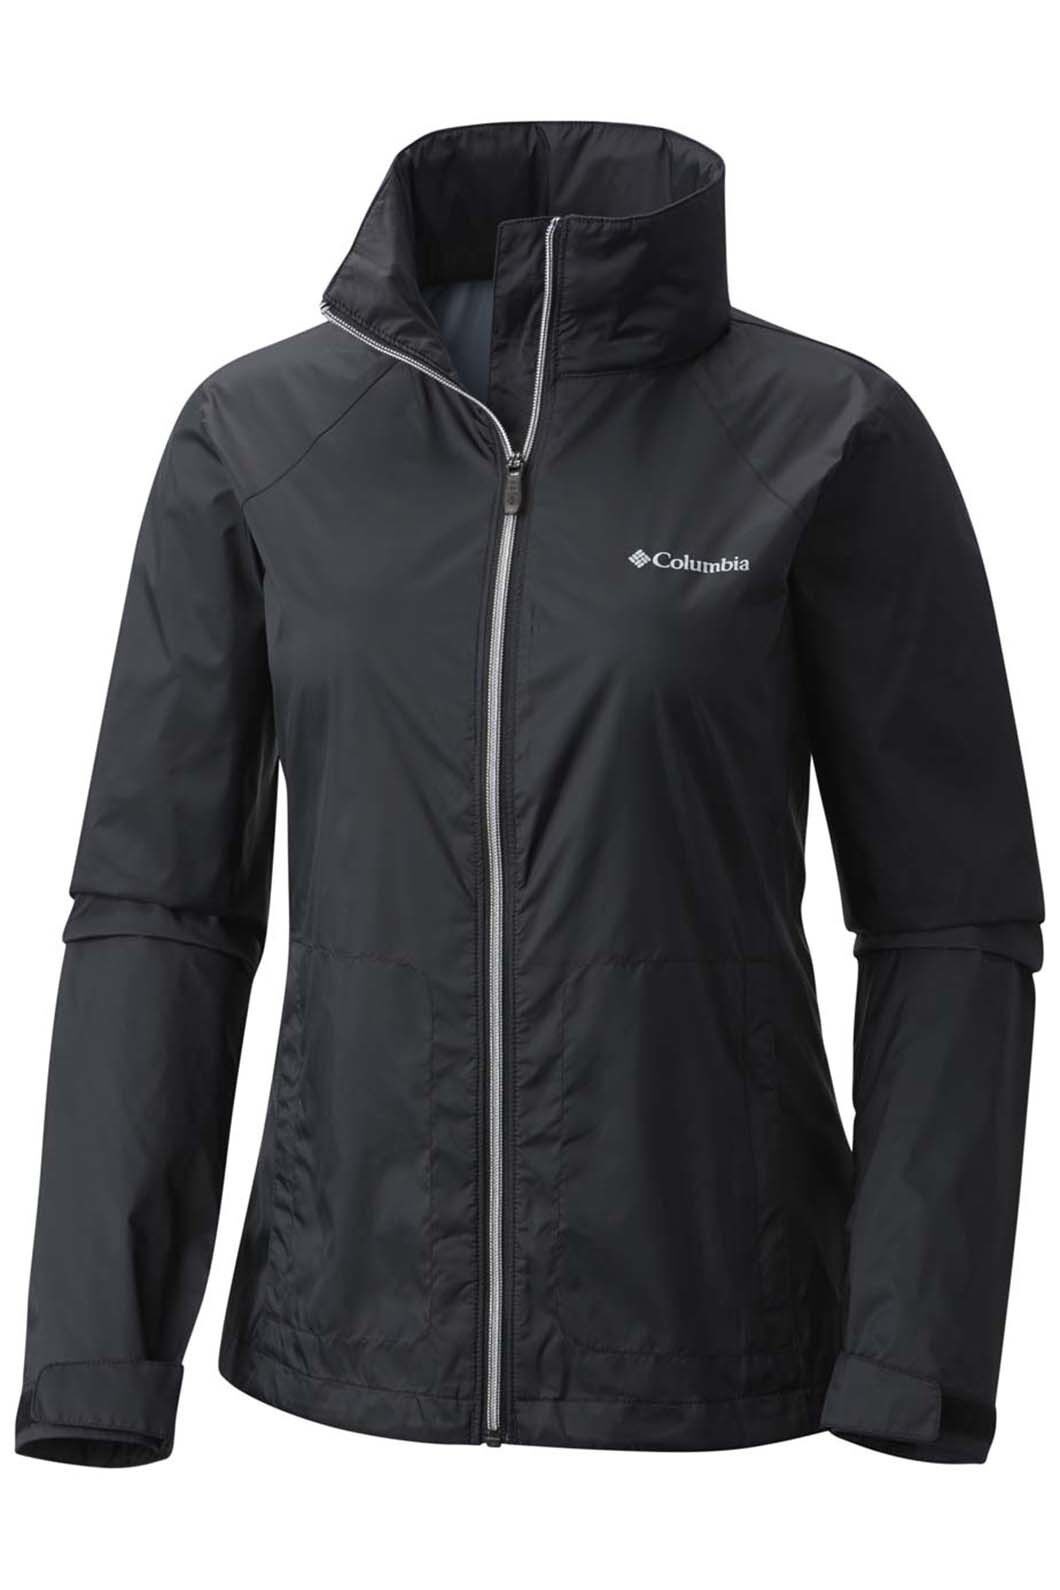 Columbia Switchback III Rain Jacket - Women's, Black, hi-res